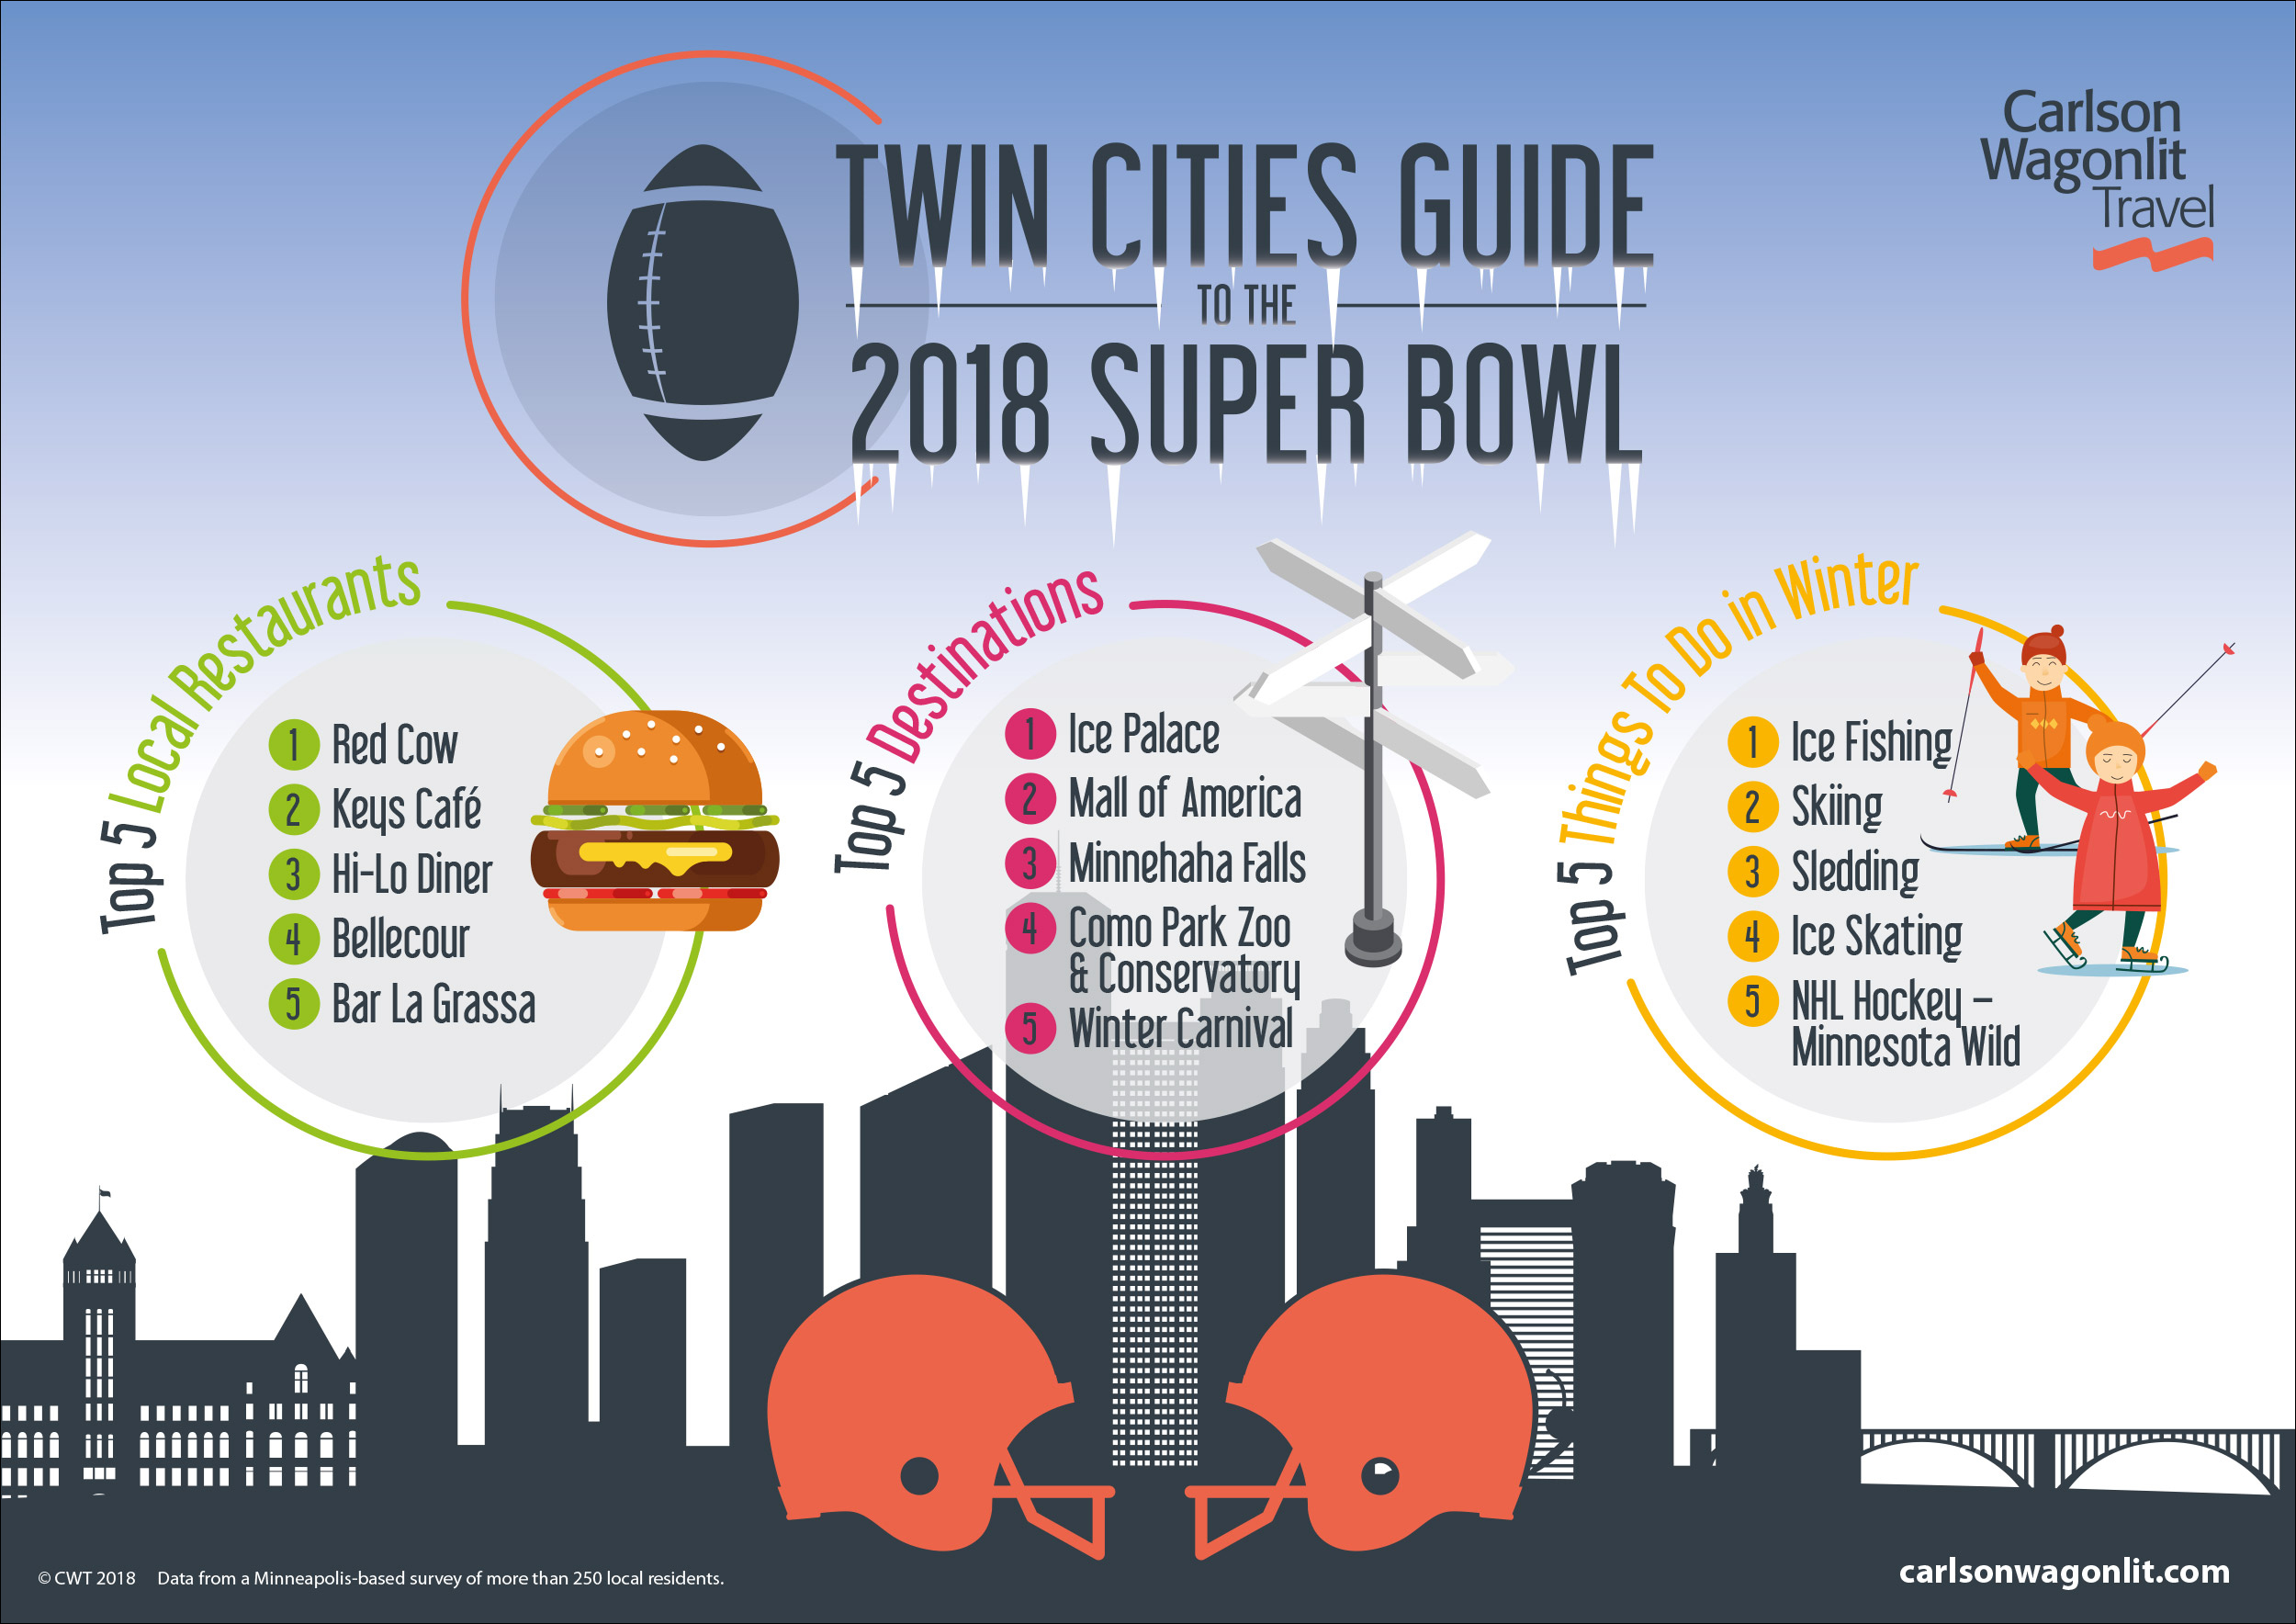 CWT-15389-Superbowl-Infographic-7.jpg